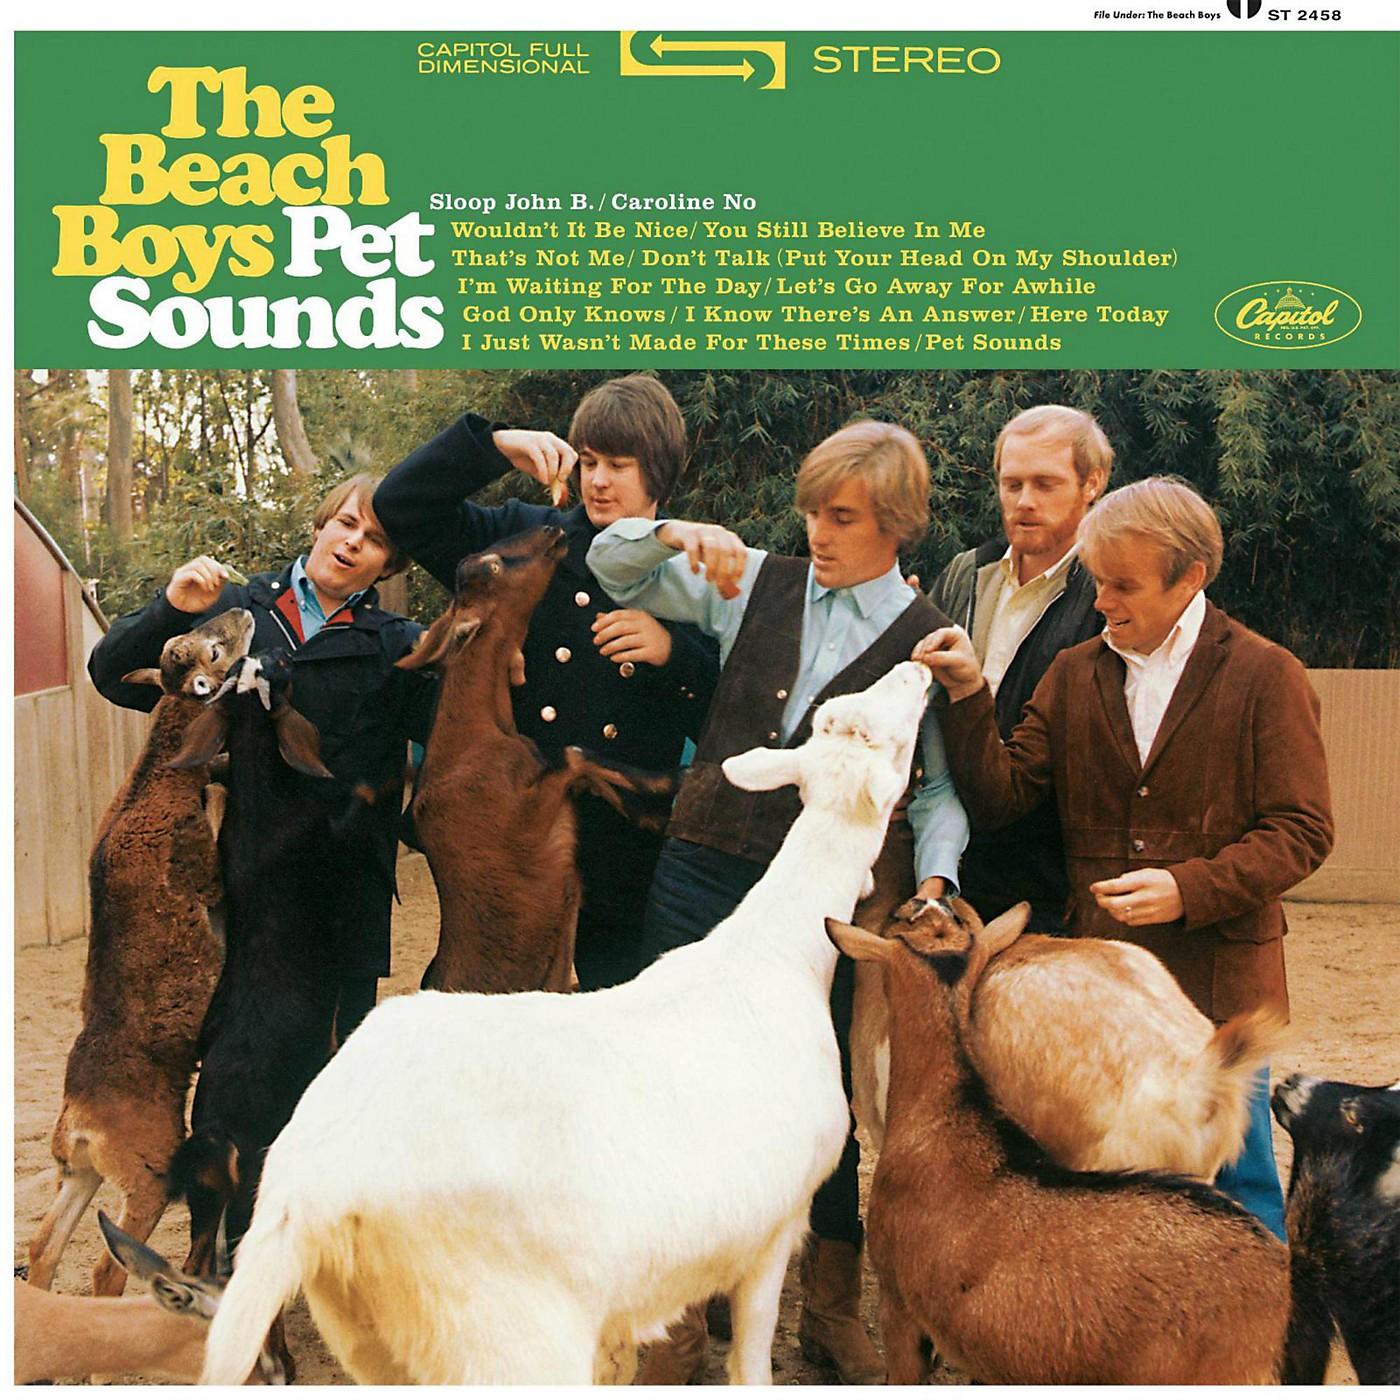 Universal Music Group The Beach Boys - Pet Sounds [LP] thumbnail